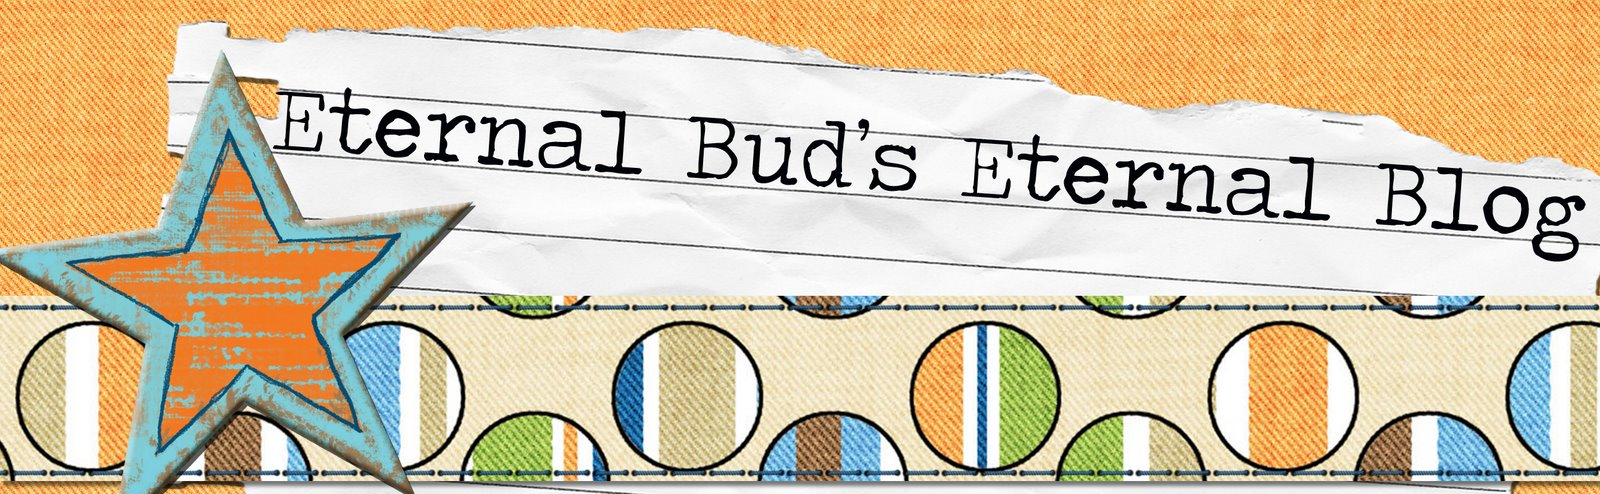 Eternal Bud's Eternal Blog